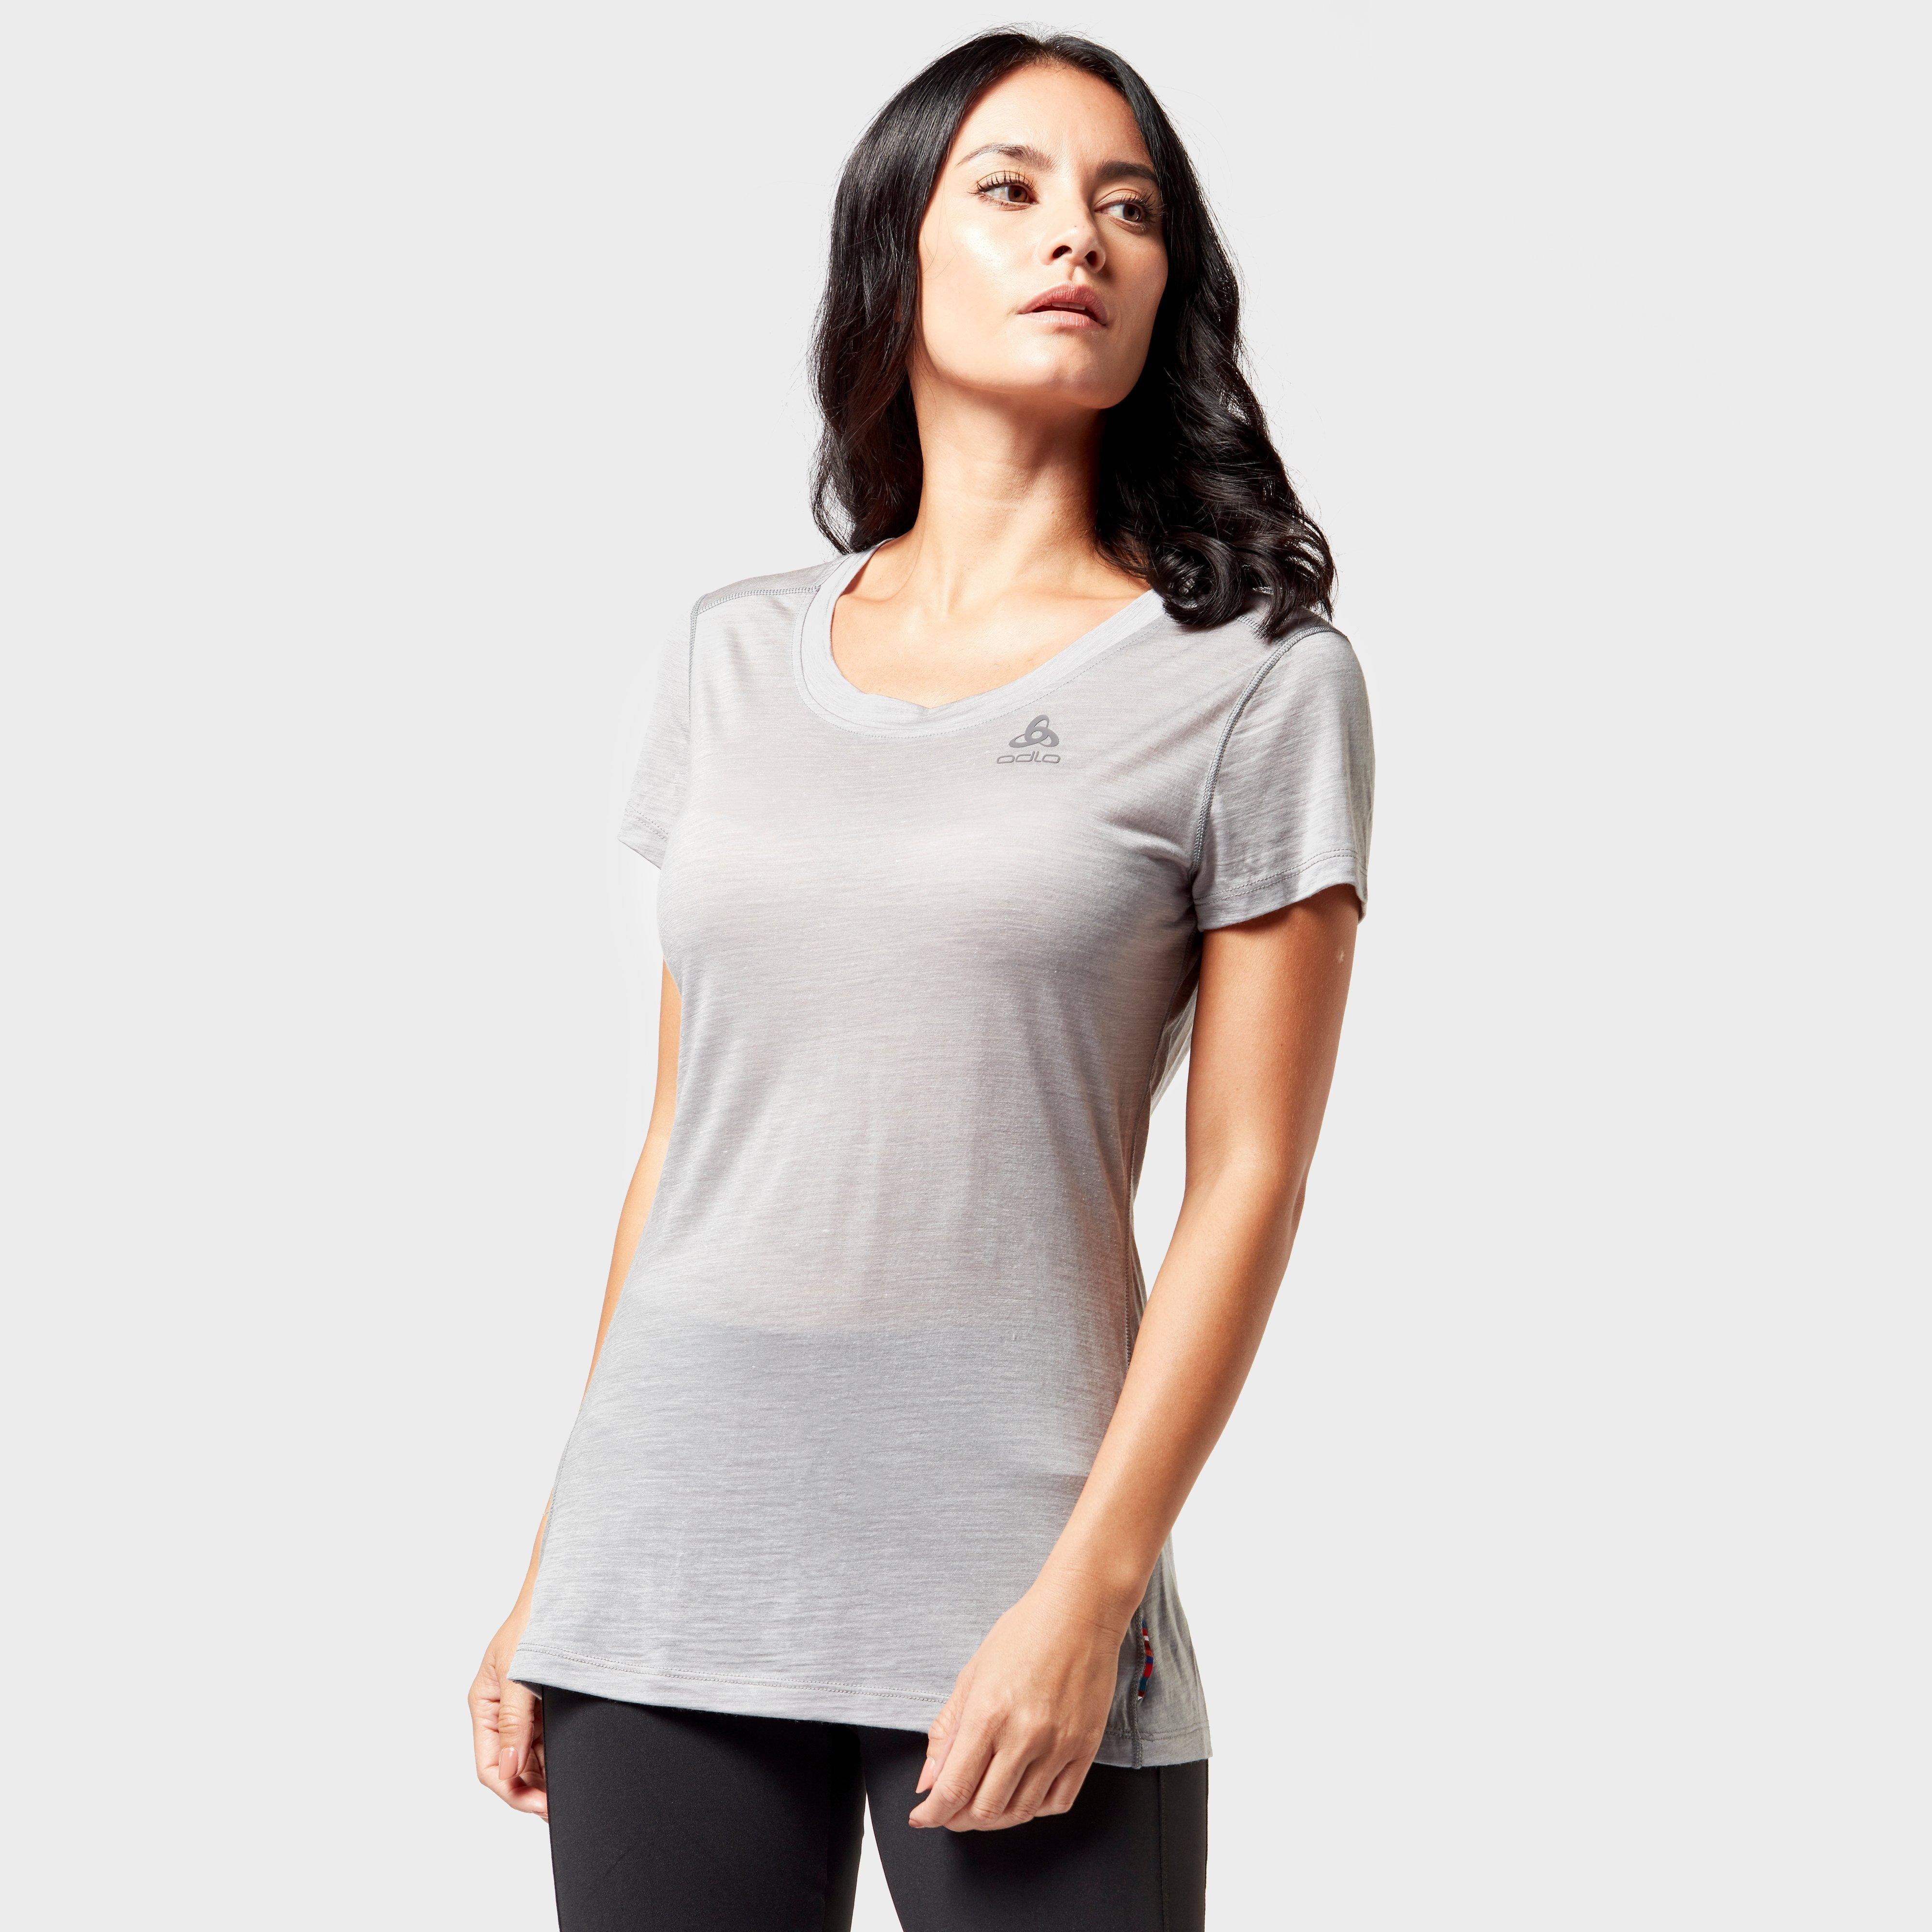 Odlo Odlo Womens Natural + Light Baselayer Crew - Grey, Grey